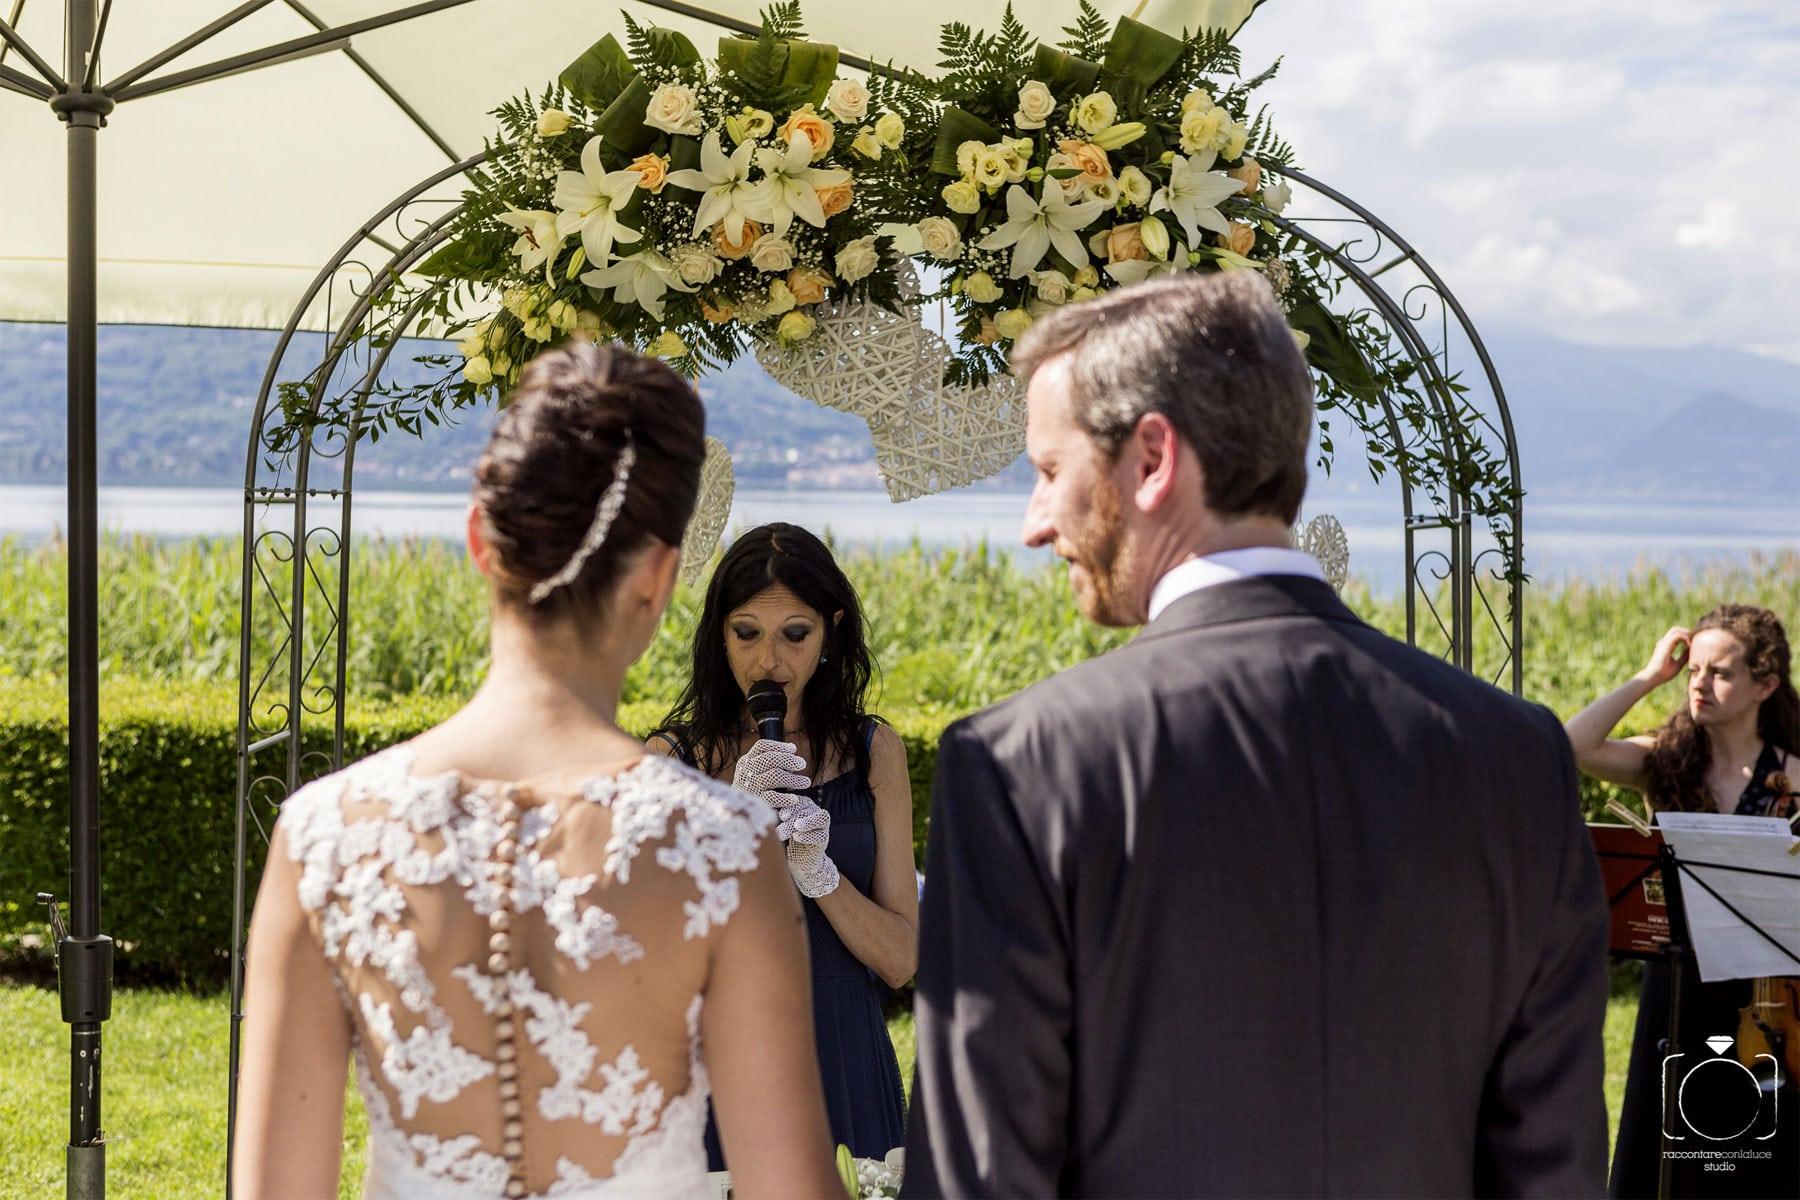 Celebrante Matrimonio Simbolico Liguria : Celebrante per cerimonia di matrimonio simbolico by ariel